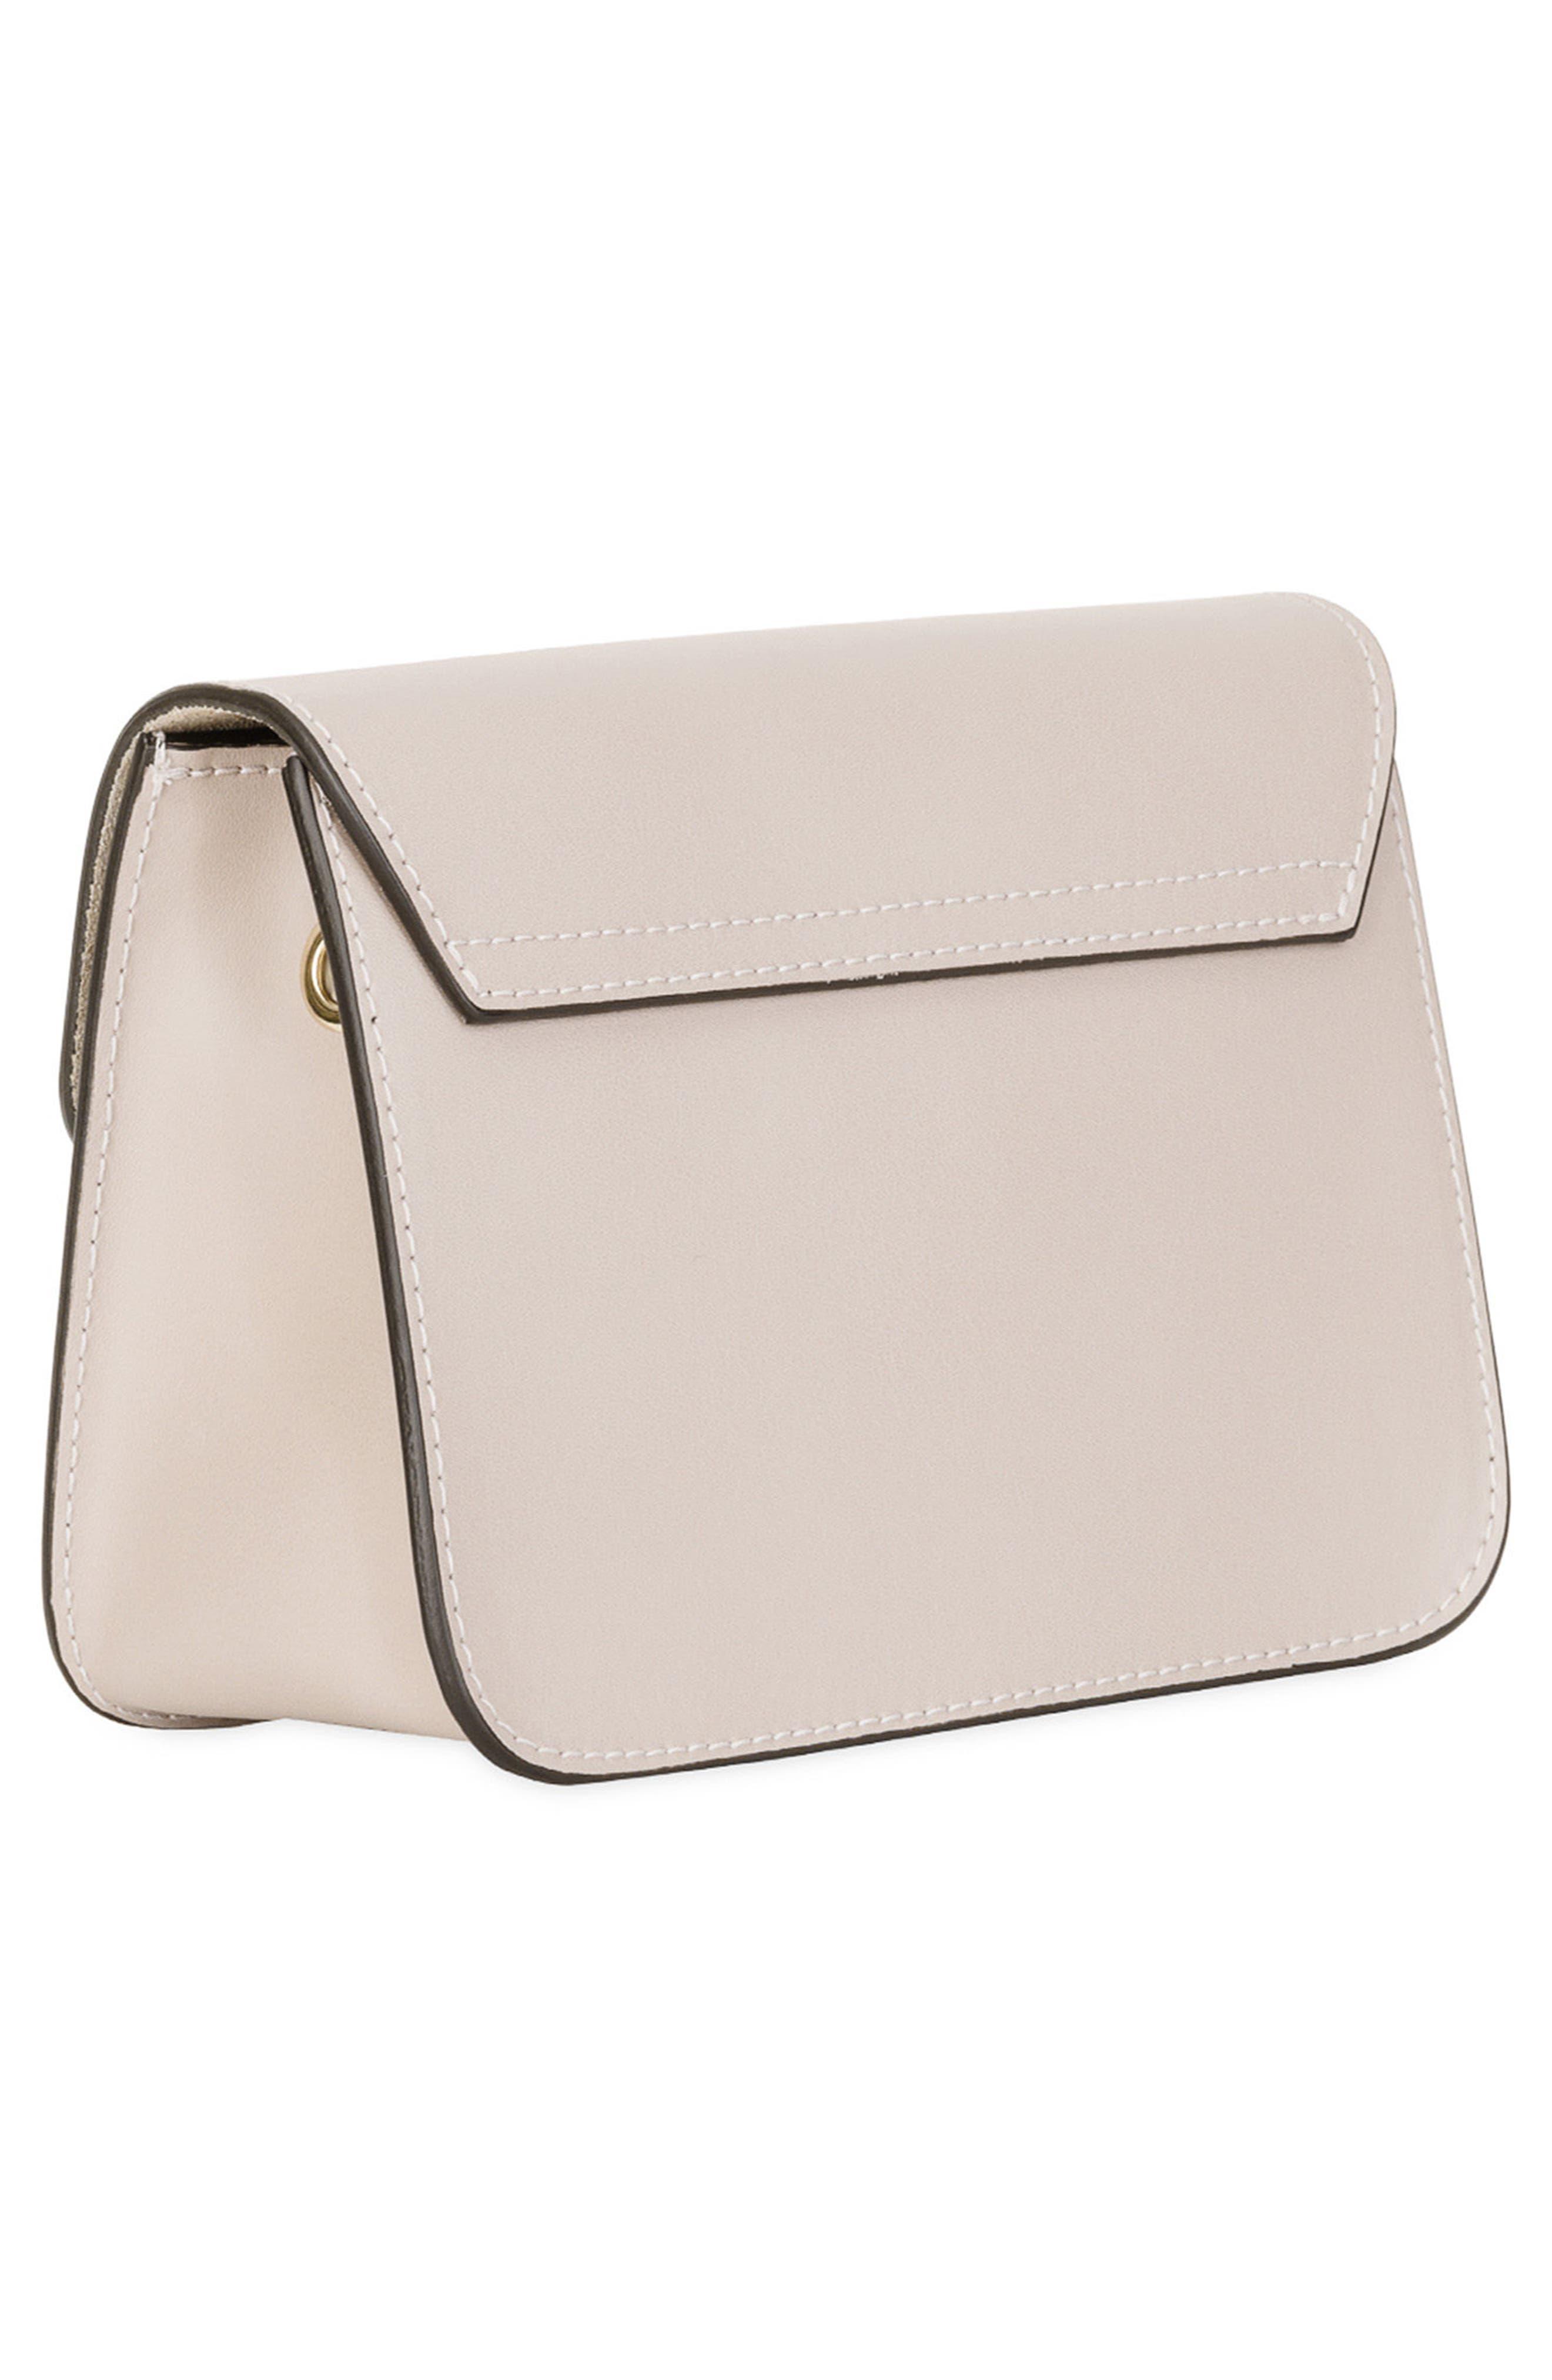 Mini Metropolis Leather Crossbody Bag,                             Alternate thumbnail 2, color,                             Vaniglia